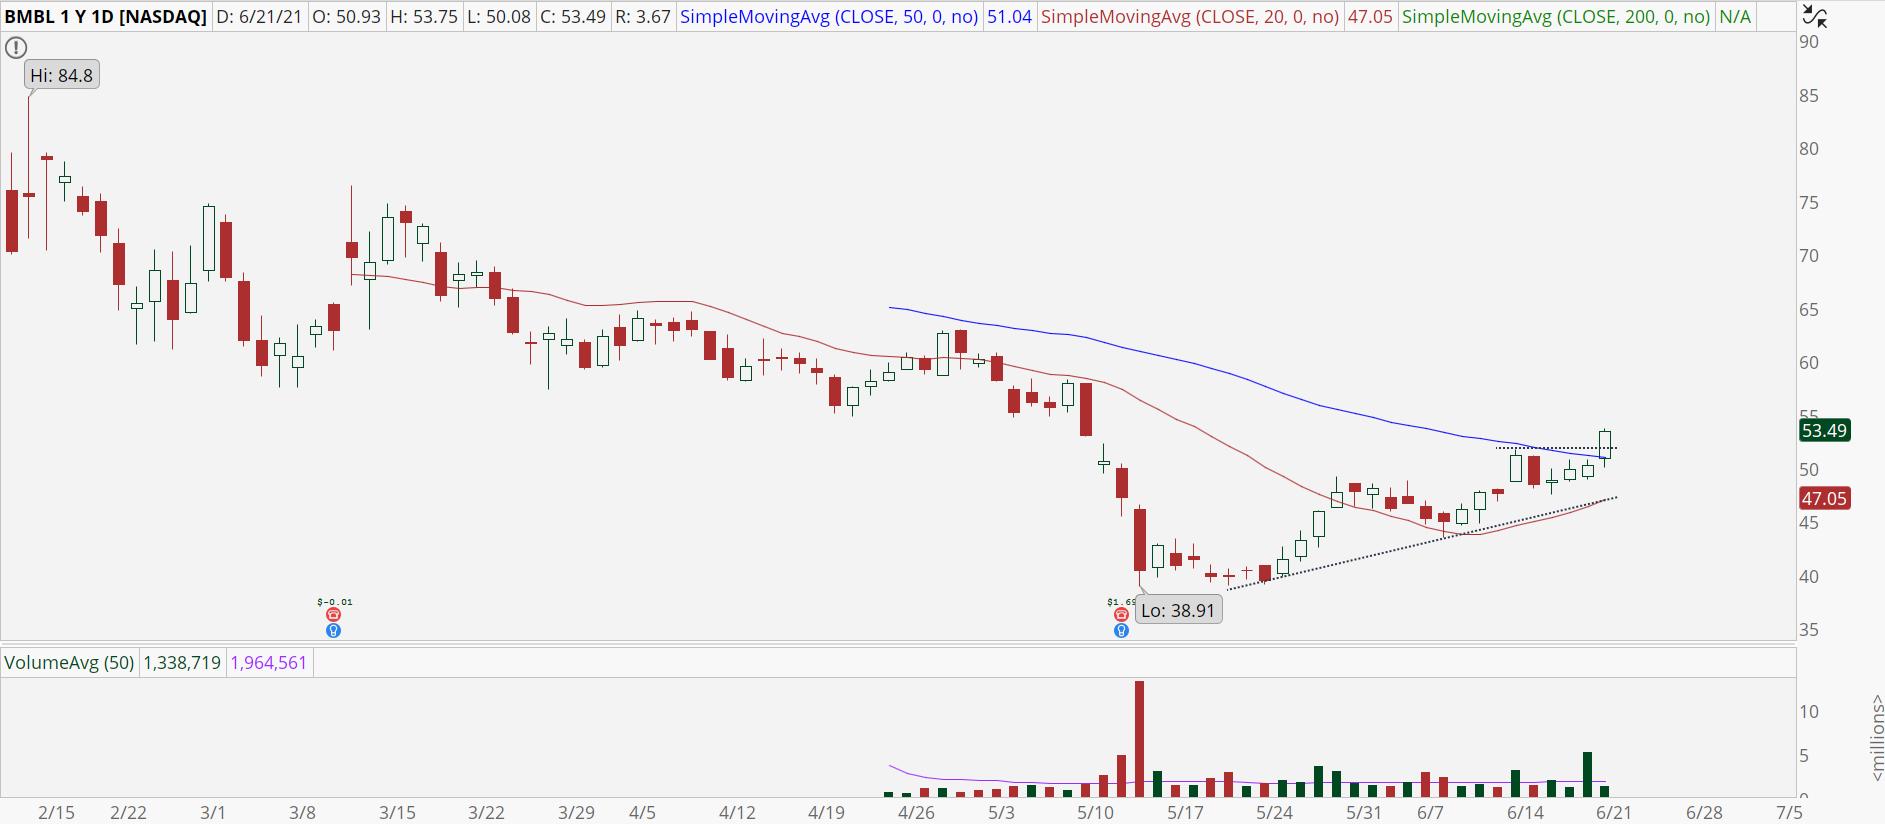 Bumble (BMBL) stock chart with bullish breakout